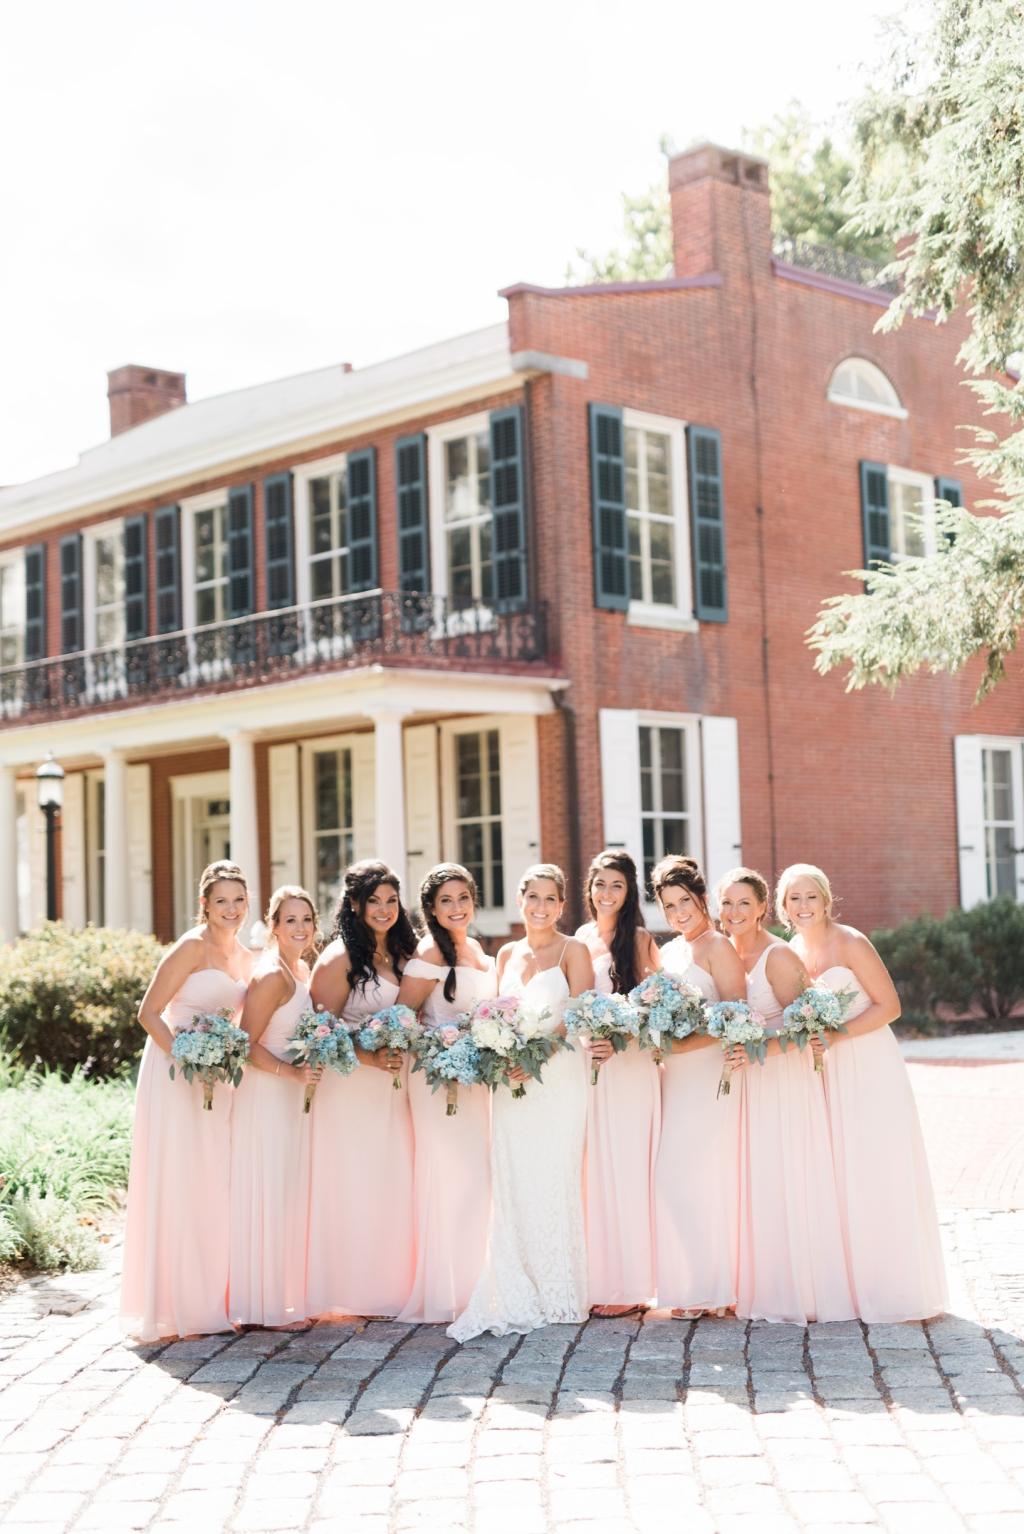 haley-richter-photography-buena-vista-confrence-center-wedding-summer-027